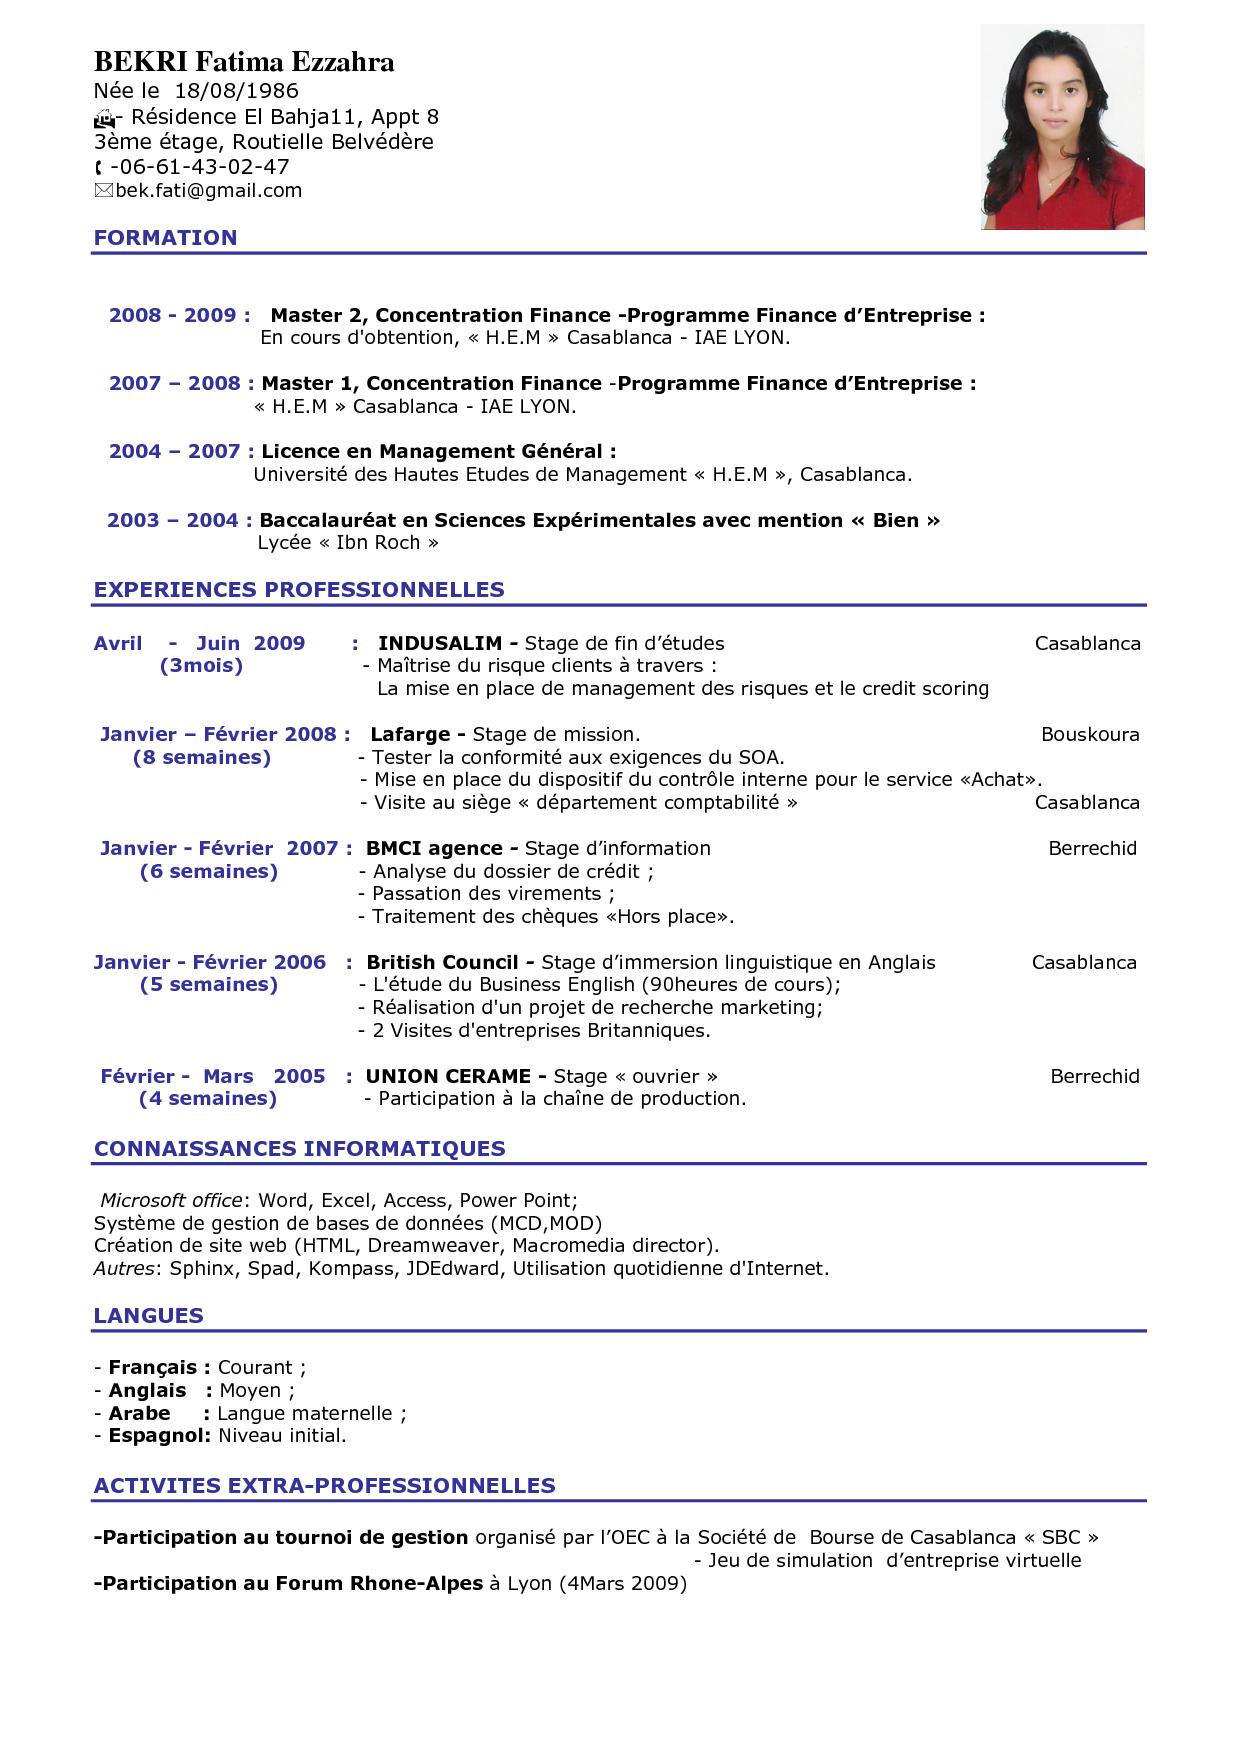 Resume Format  Modele Curriculum Vitae Shqip Kh8dI6Nm